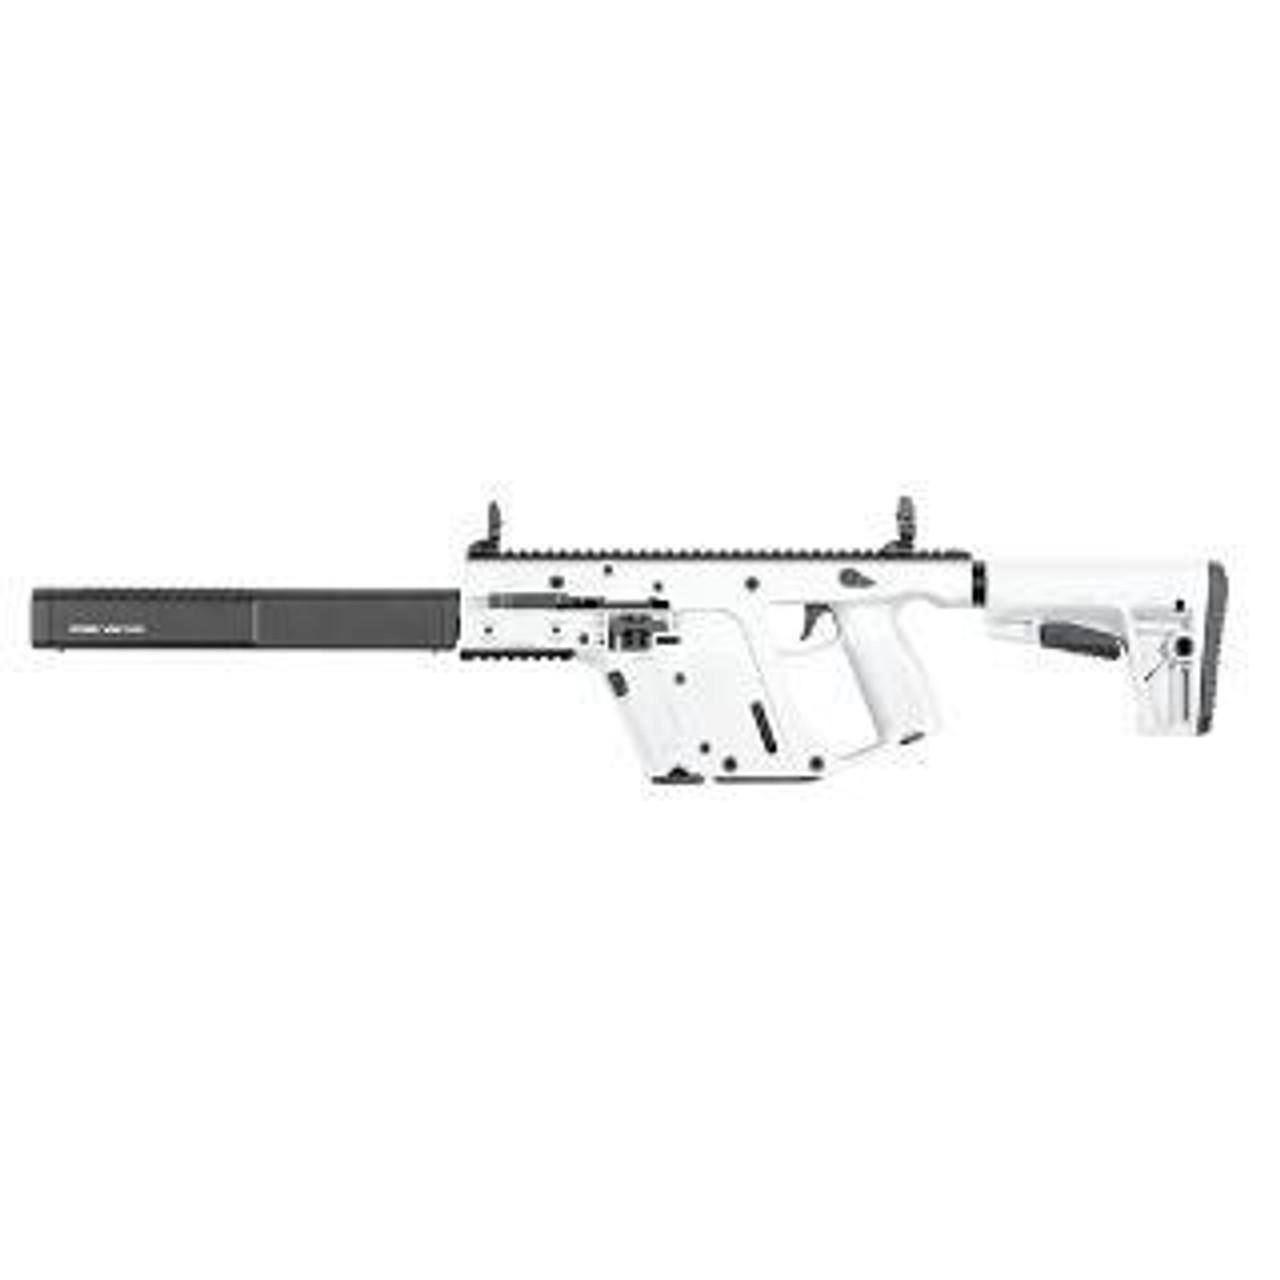 Kriss Vector CRB G2  Alpine White - California Legal - 10mm